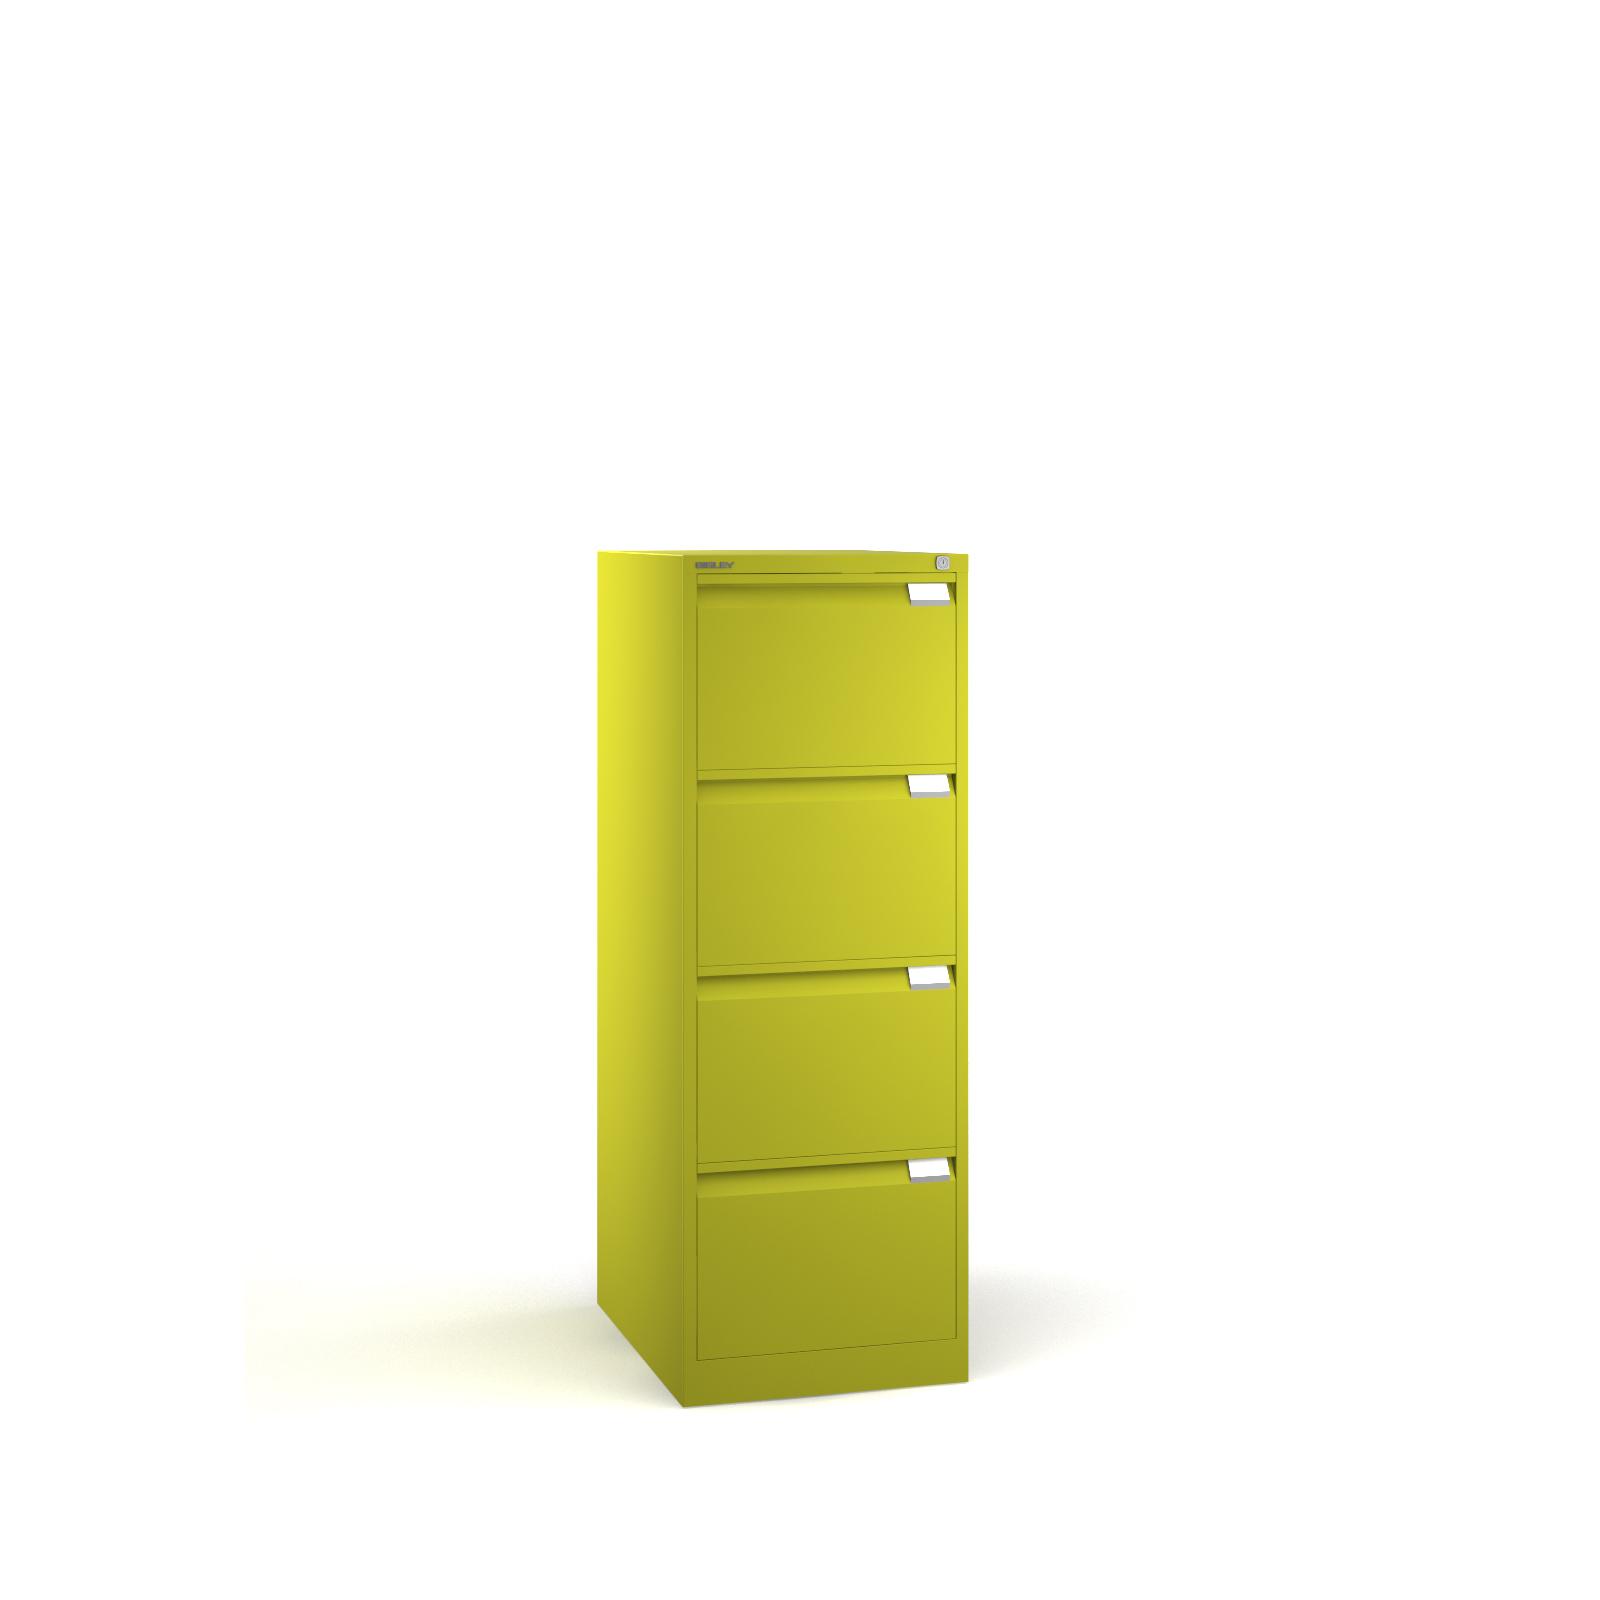 Bisley 4 drawer BS filing cabinet 1321mm - green